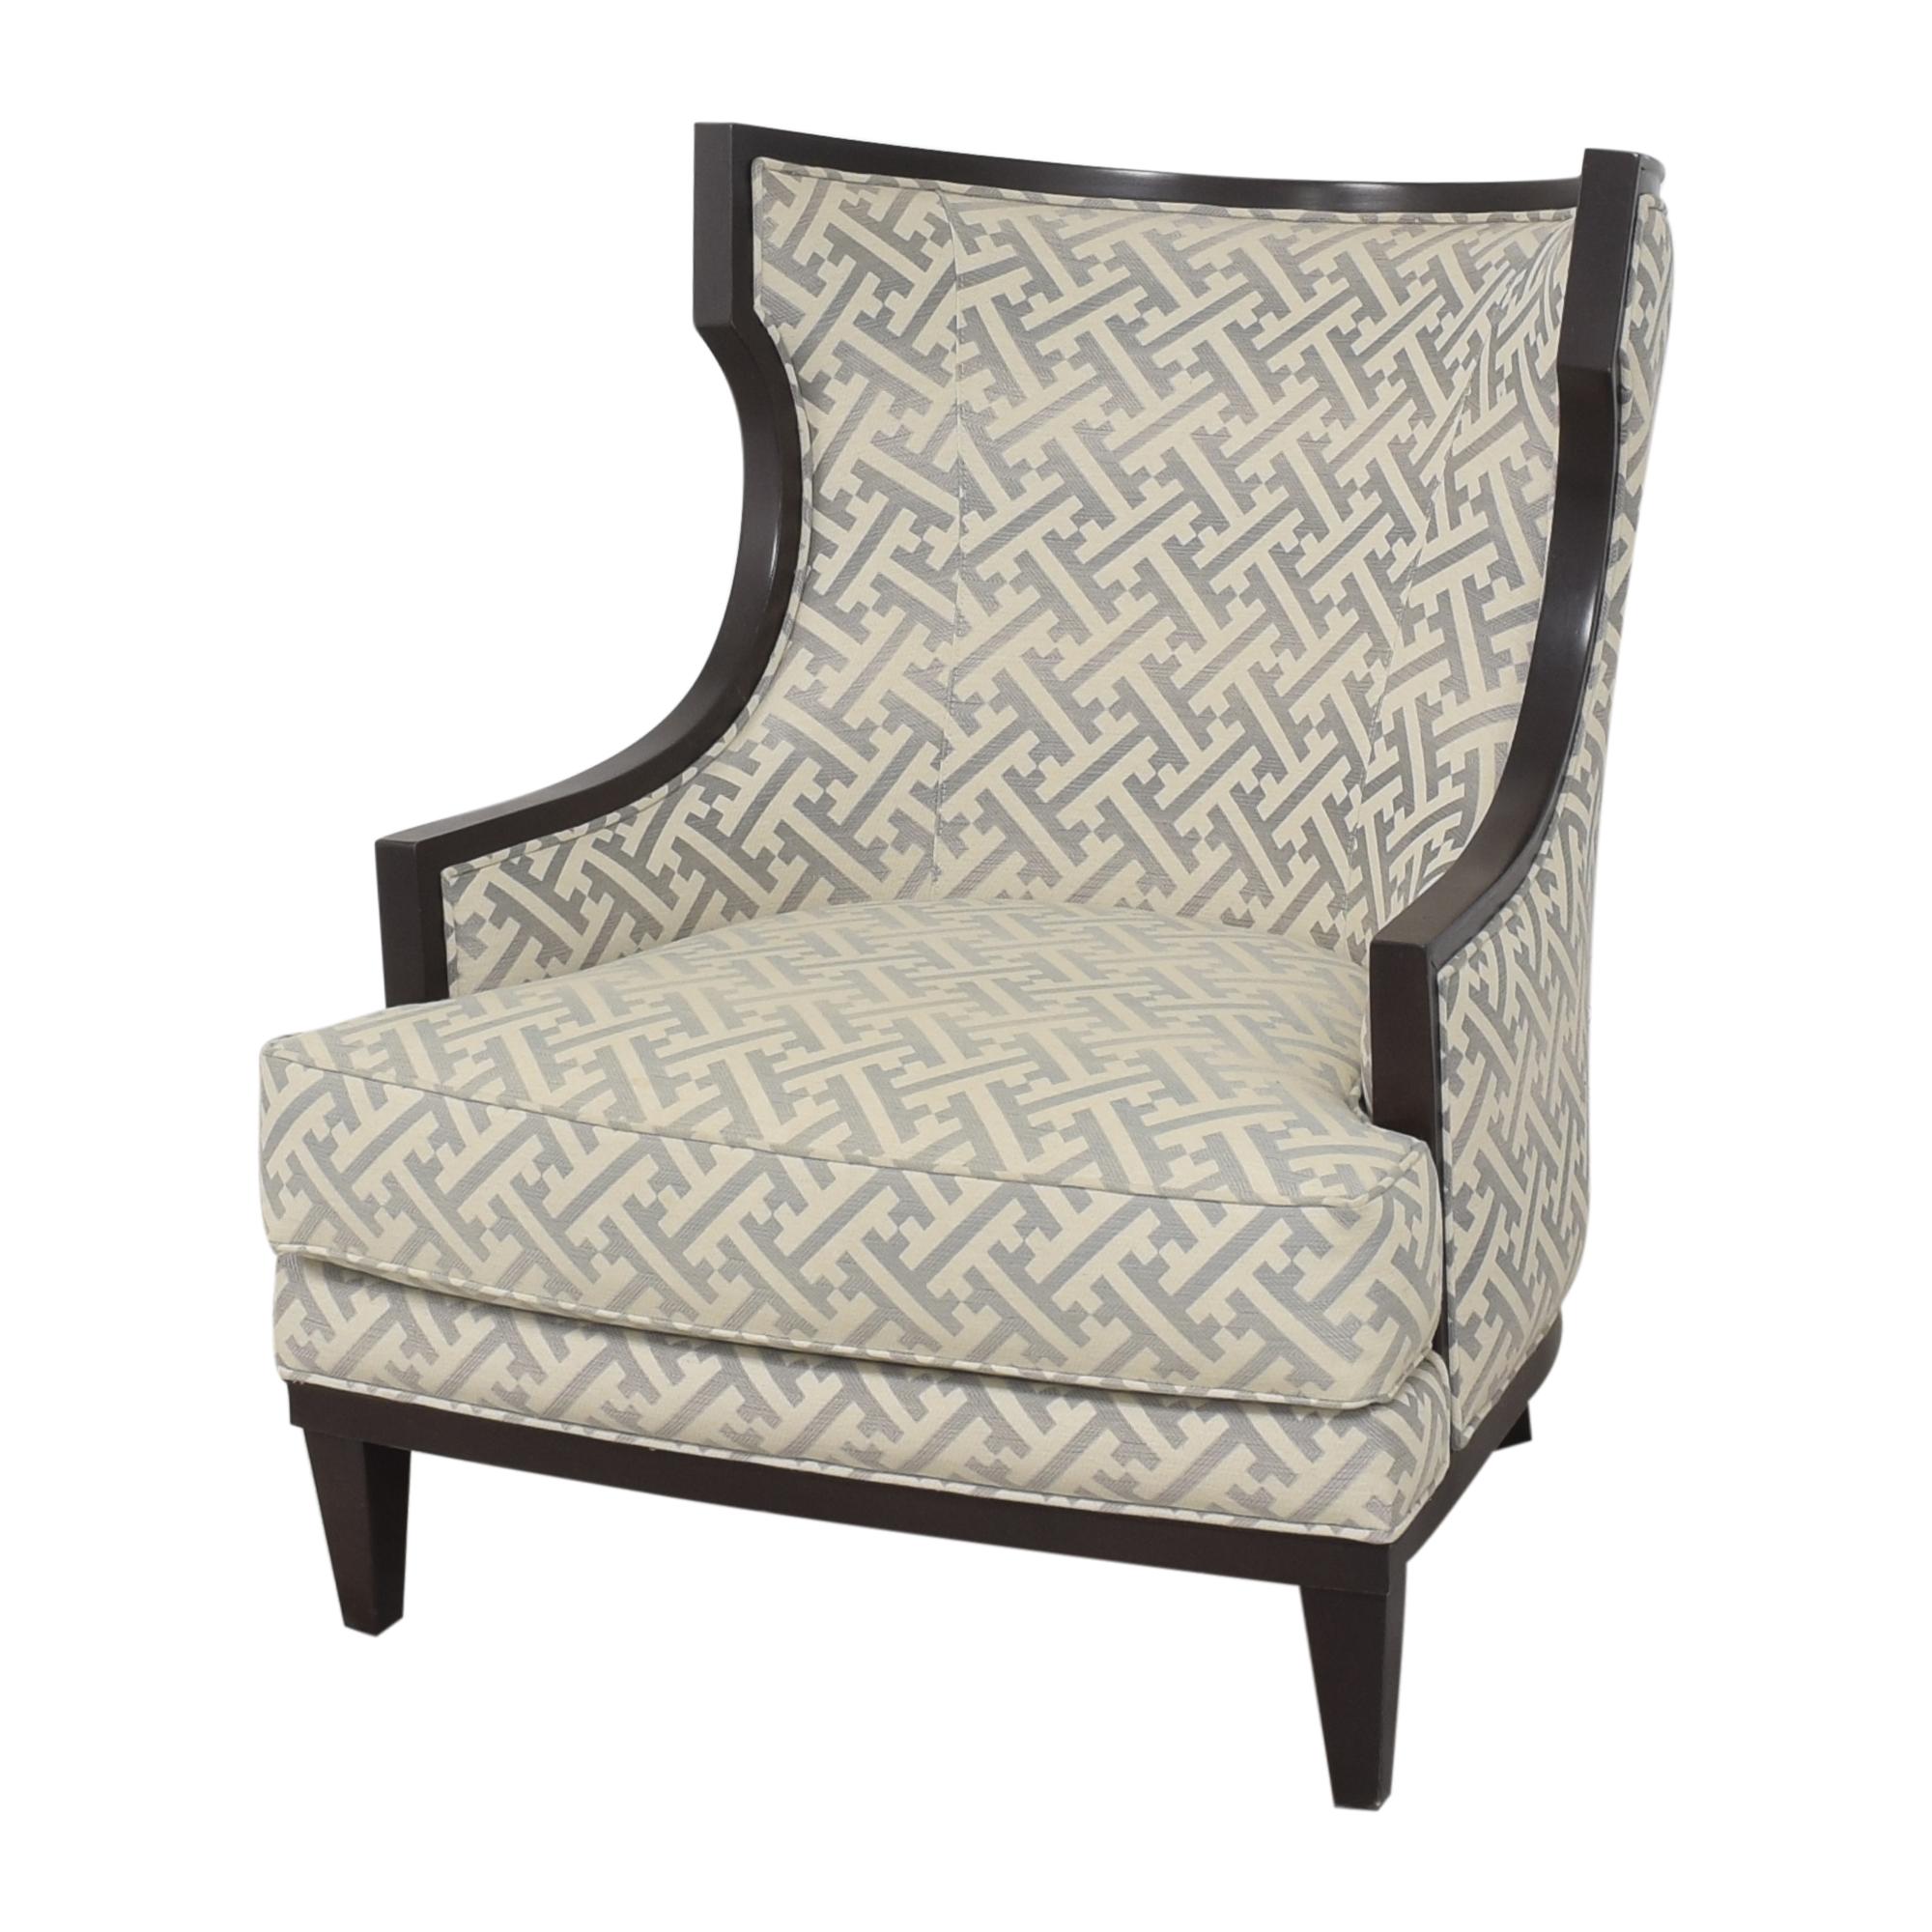 Ethan Allen Ethan Allen Corrine Chair pa